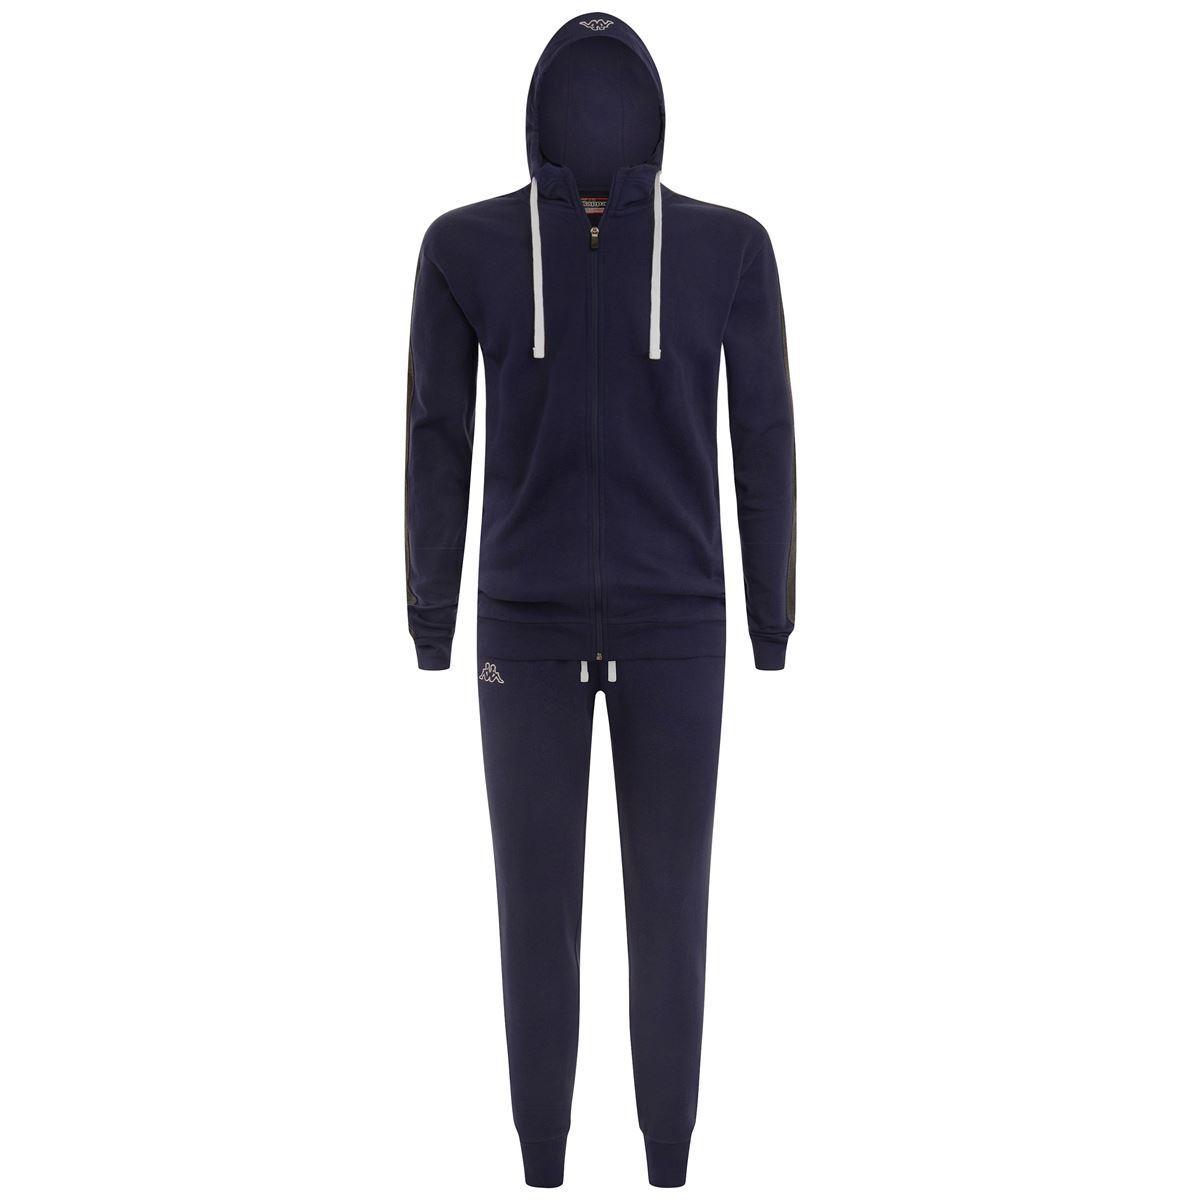 Kappa Suit Tuta Sportiva Slim Fit da Uomo Felpa Cappuccio Training  303ZEE0 900